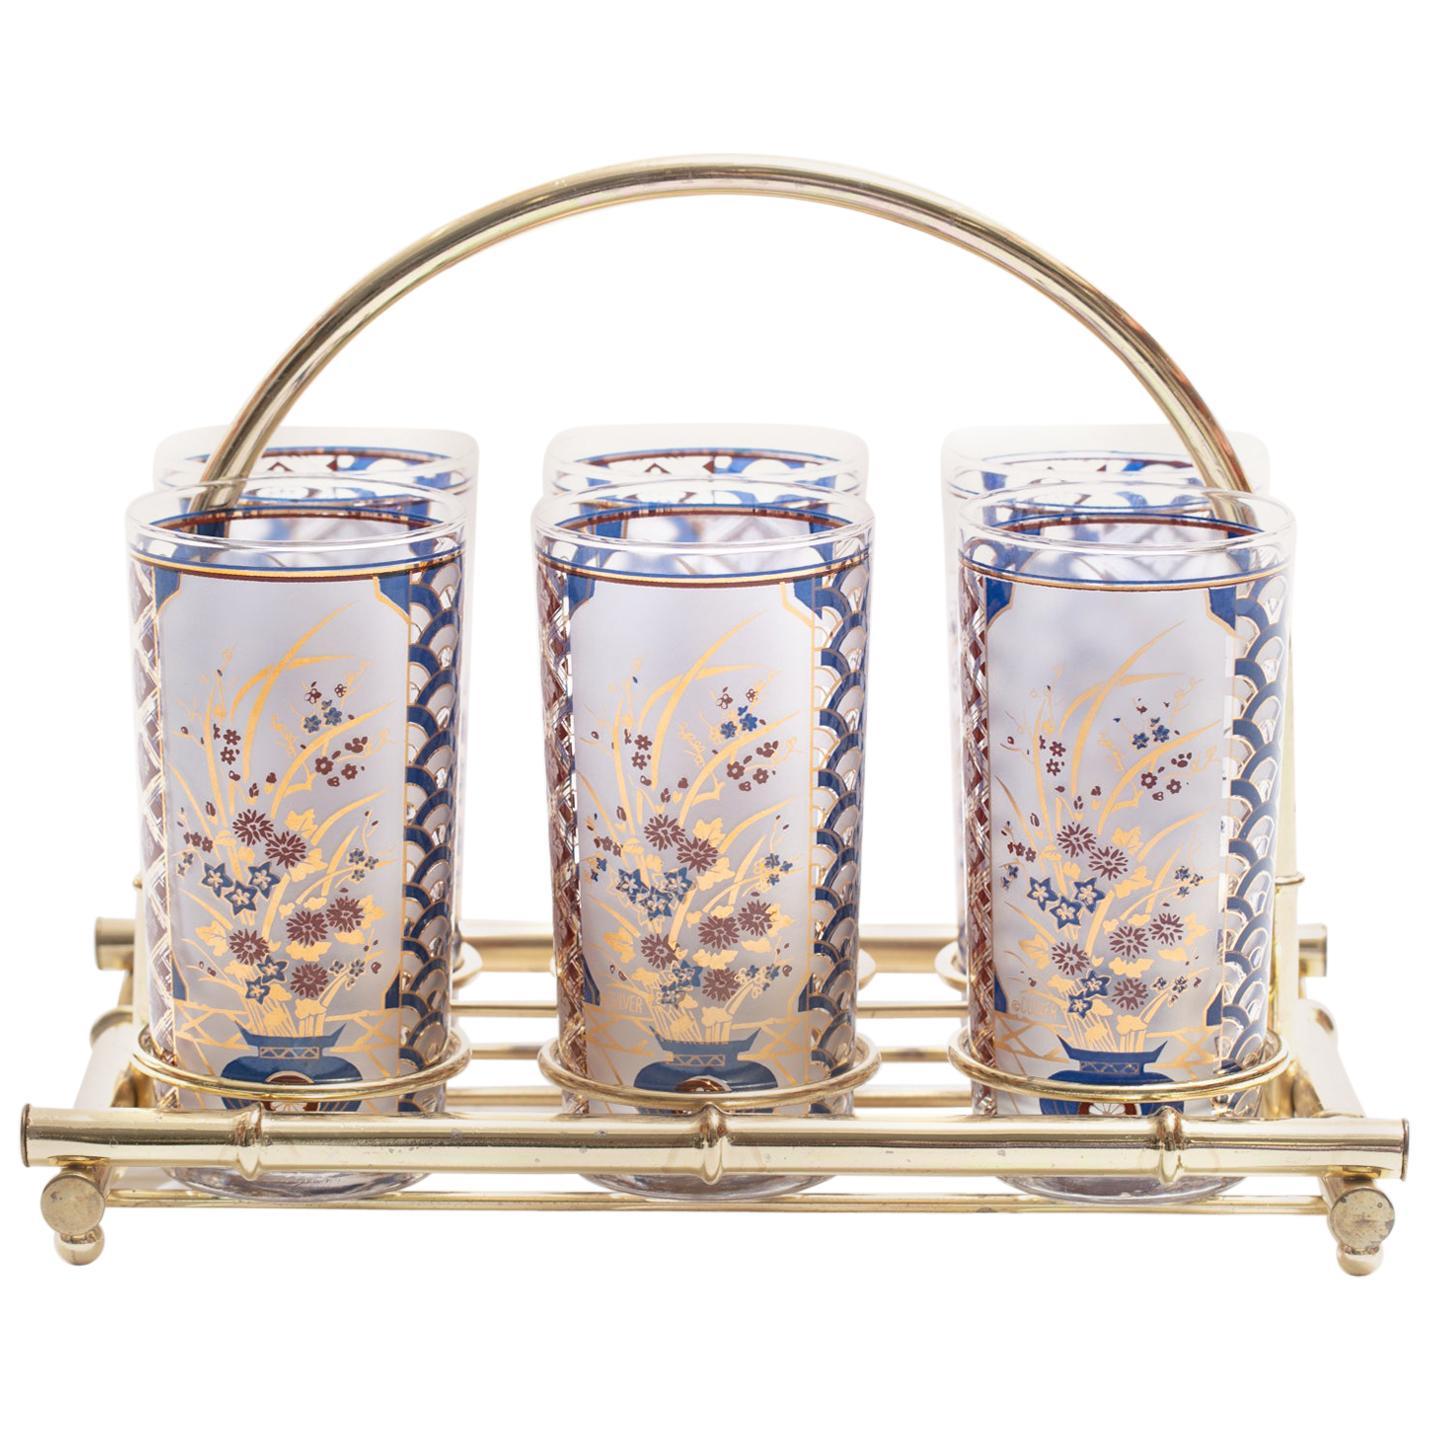 22-Karat Gold Chinoiserie Themed Tumbler Glasses & Brass Bamboo Caddy c. 1960s